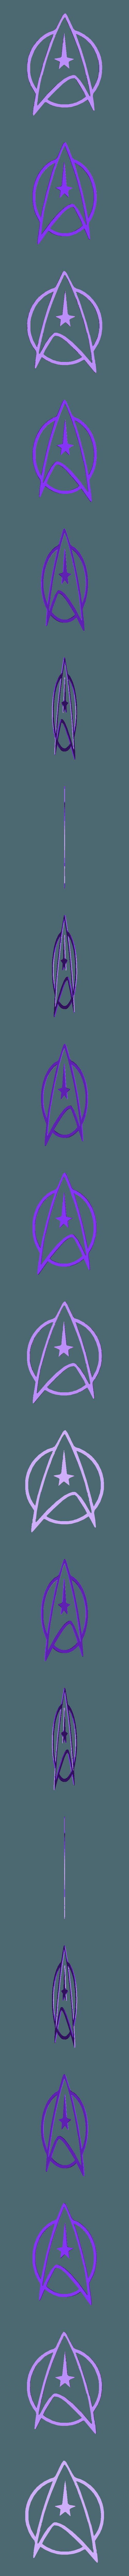 Star-Trek-Logo-Vinyl-Decal-Sticker__29045.1497016892.stl Download free STL file Star Trek logo on a leather jacket • 3D printer design, FiveNights